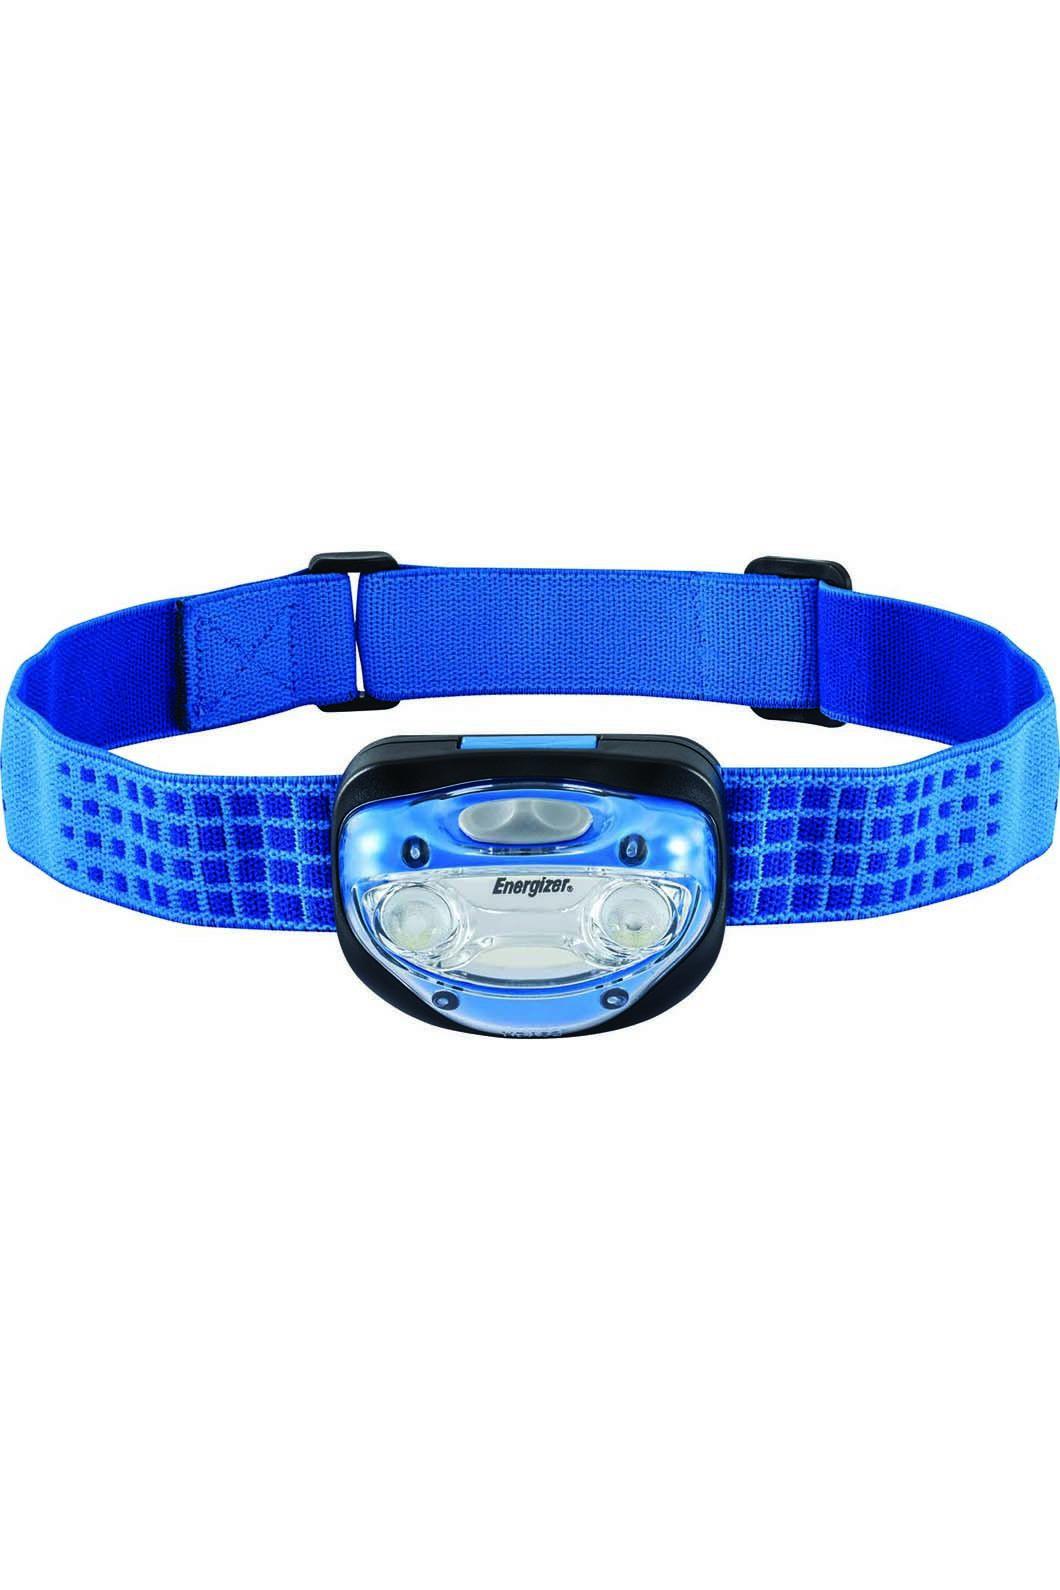 Energizer Vision Headlamp, None, hi-res